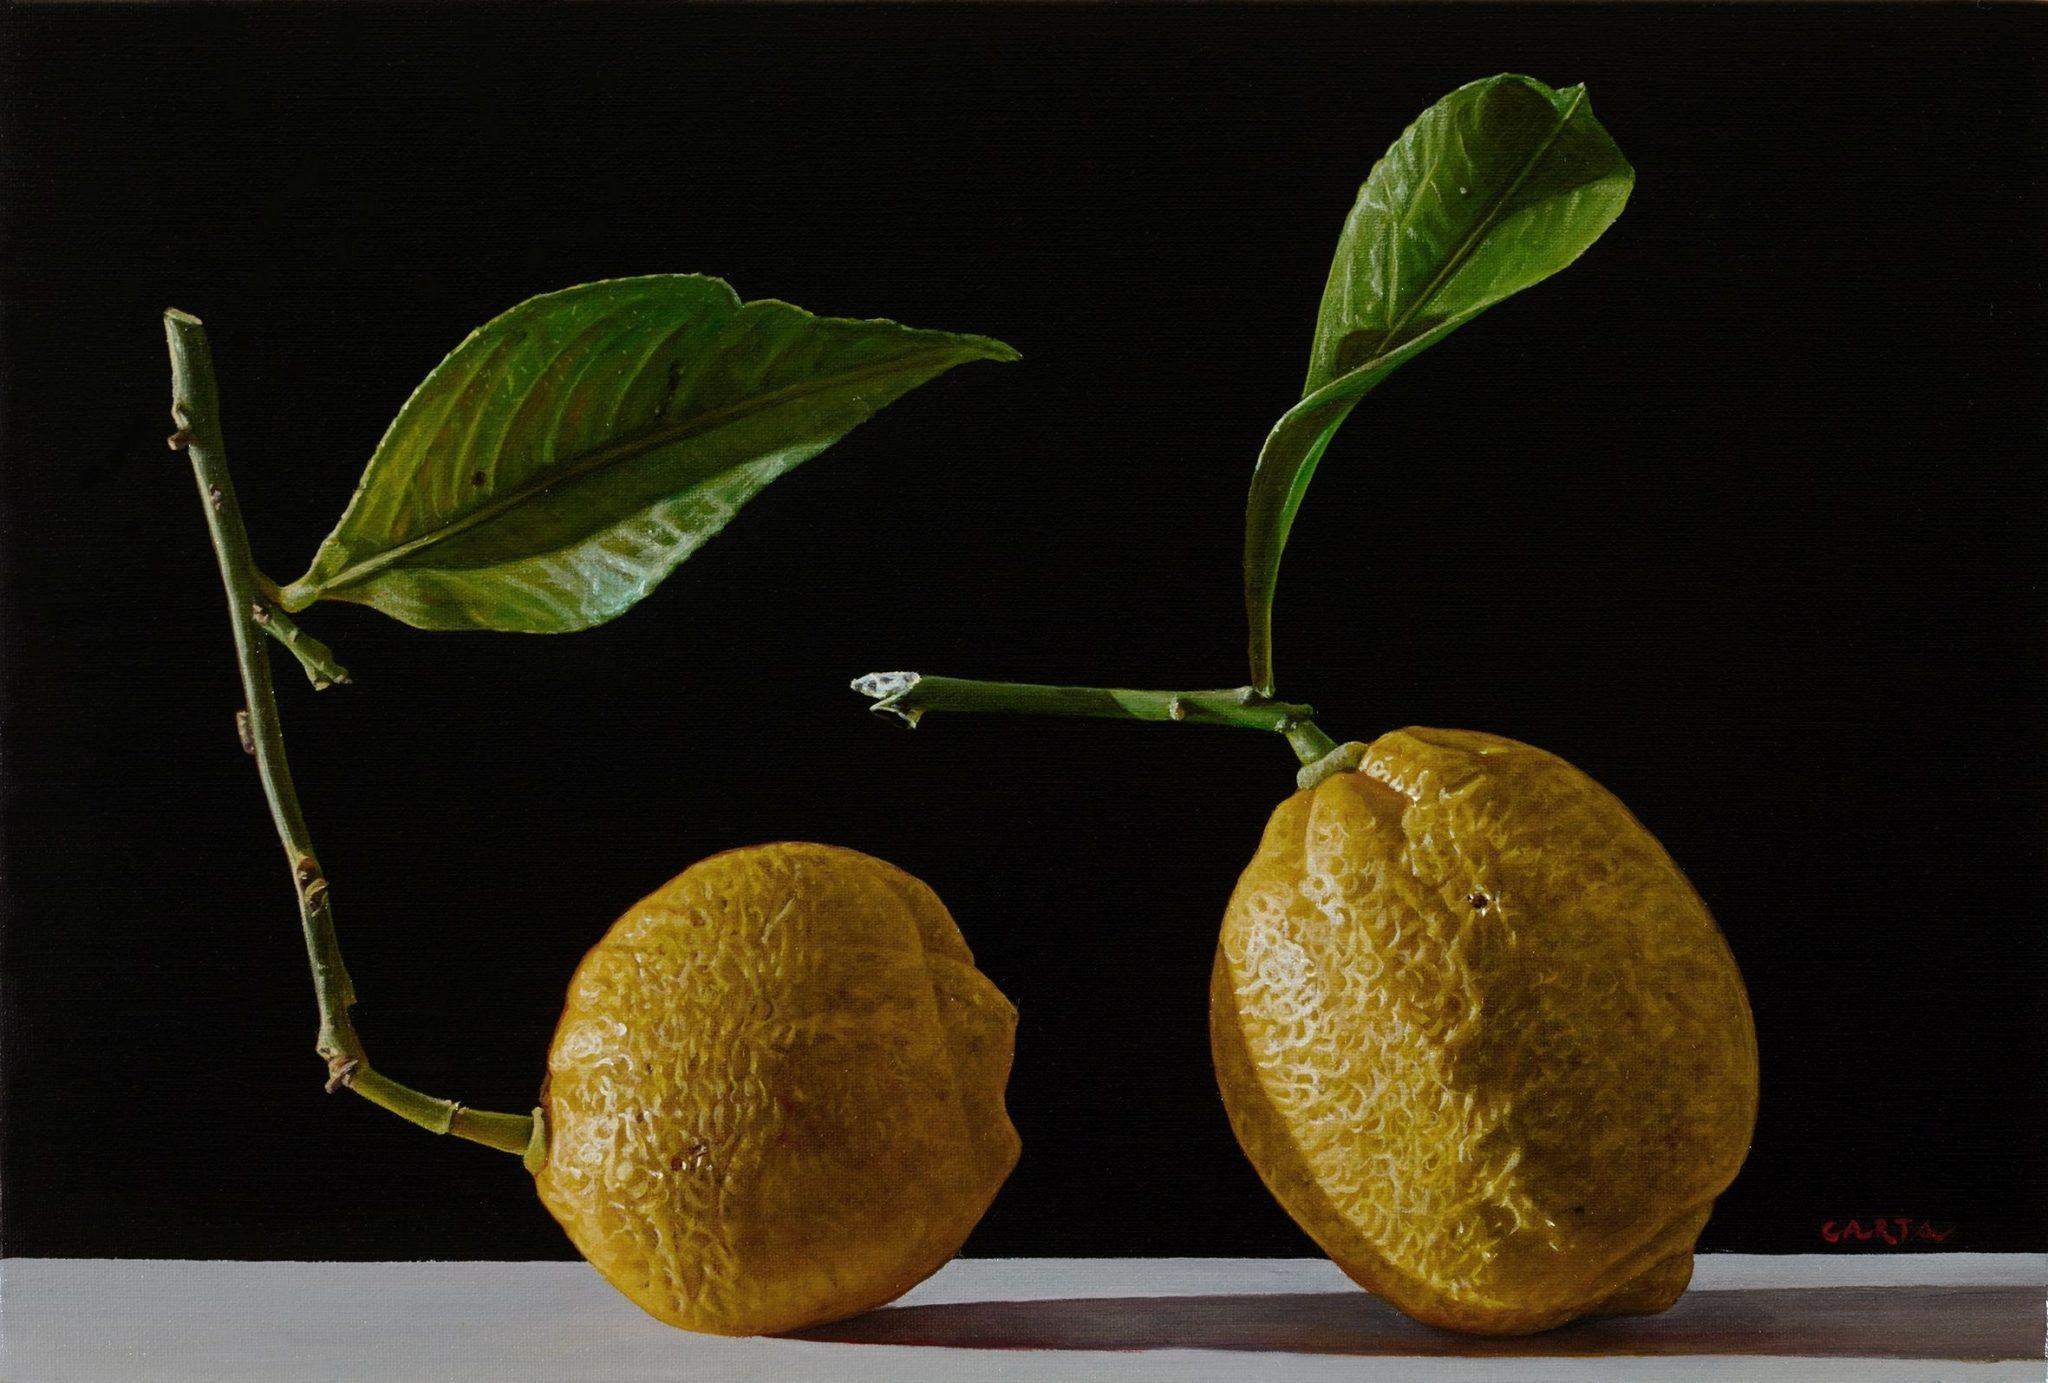 Giuseppe Carta, Germinazioni, 2015-2016, olio su tela, cm 20x30